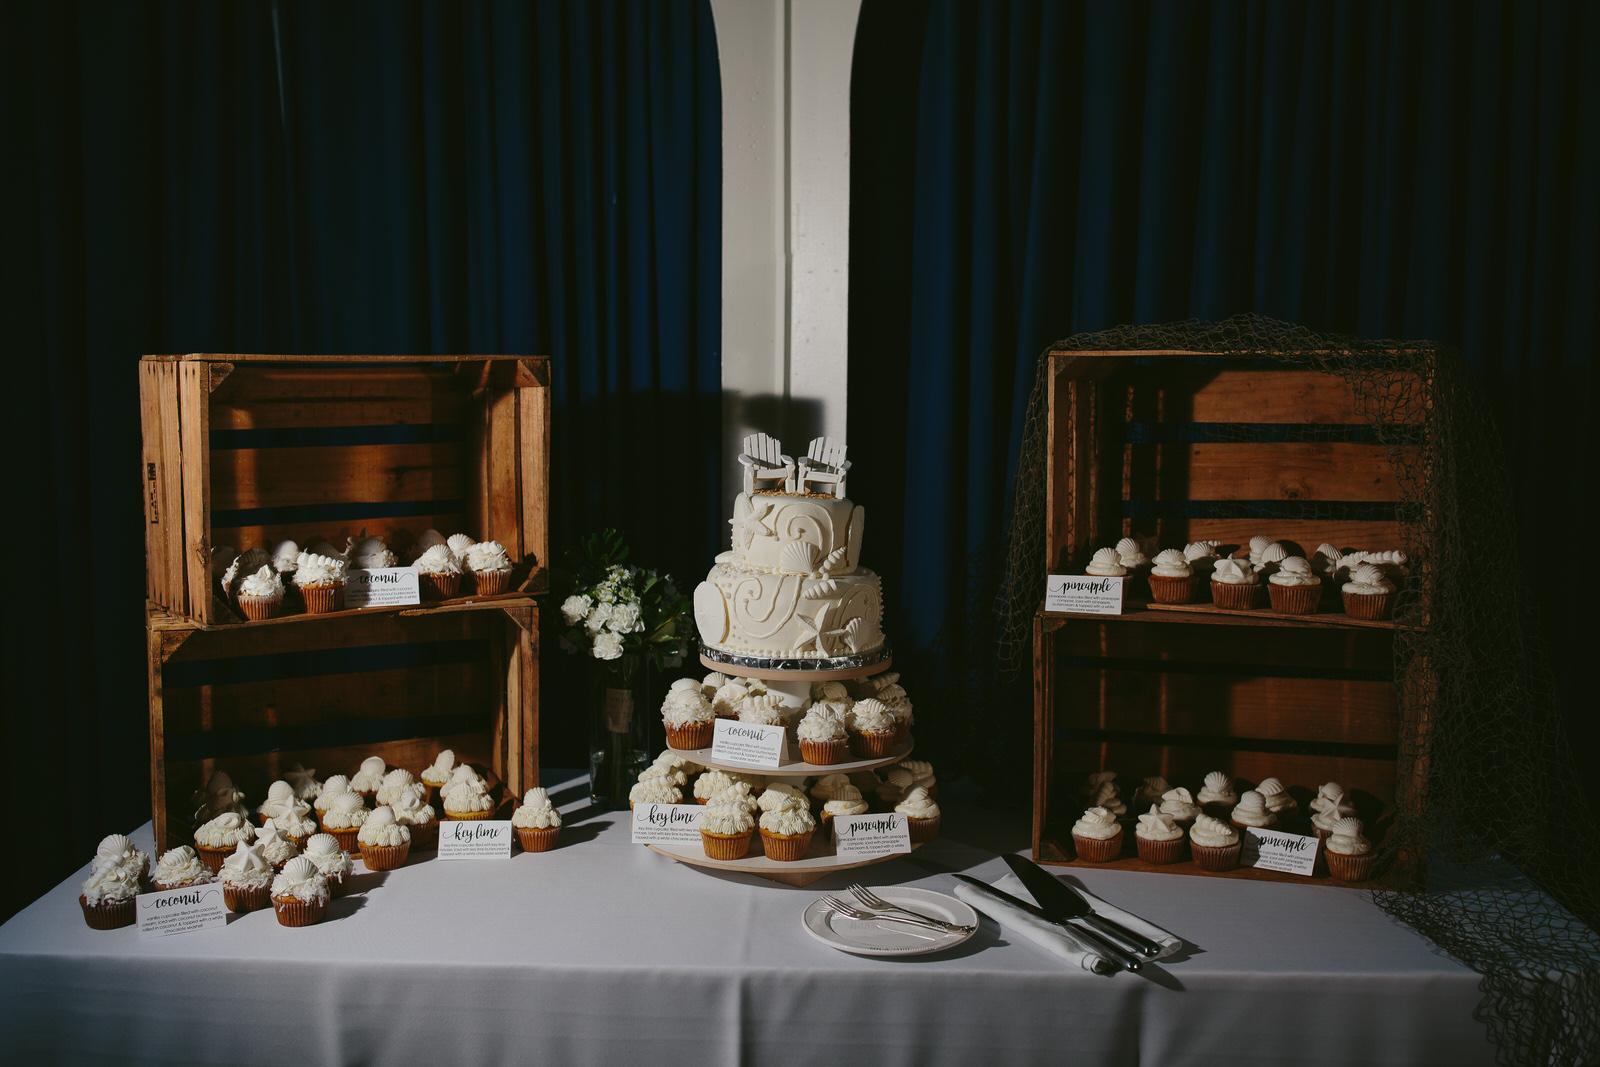 lighthouse_point_yacht_club_wedding_reception_steph_lynn_photo-5.jpg